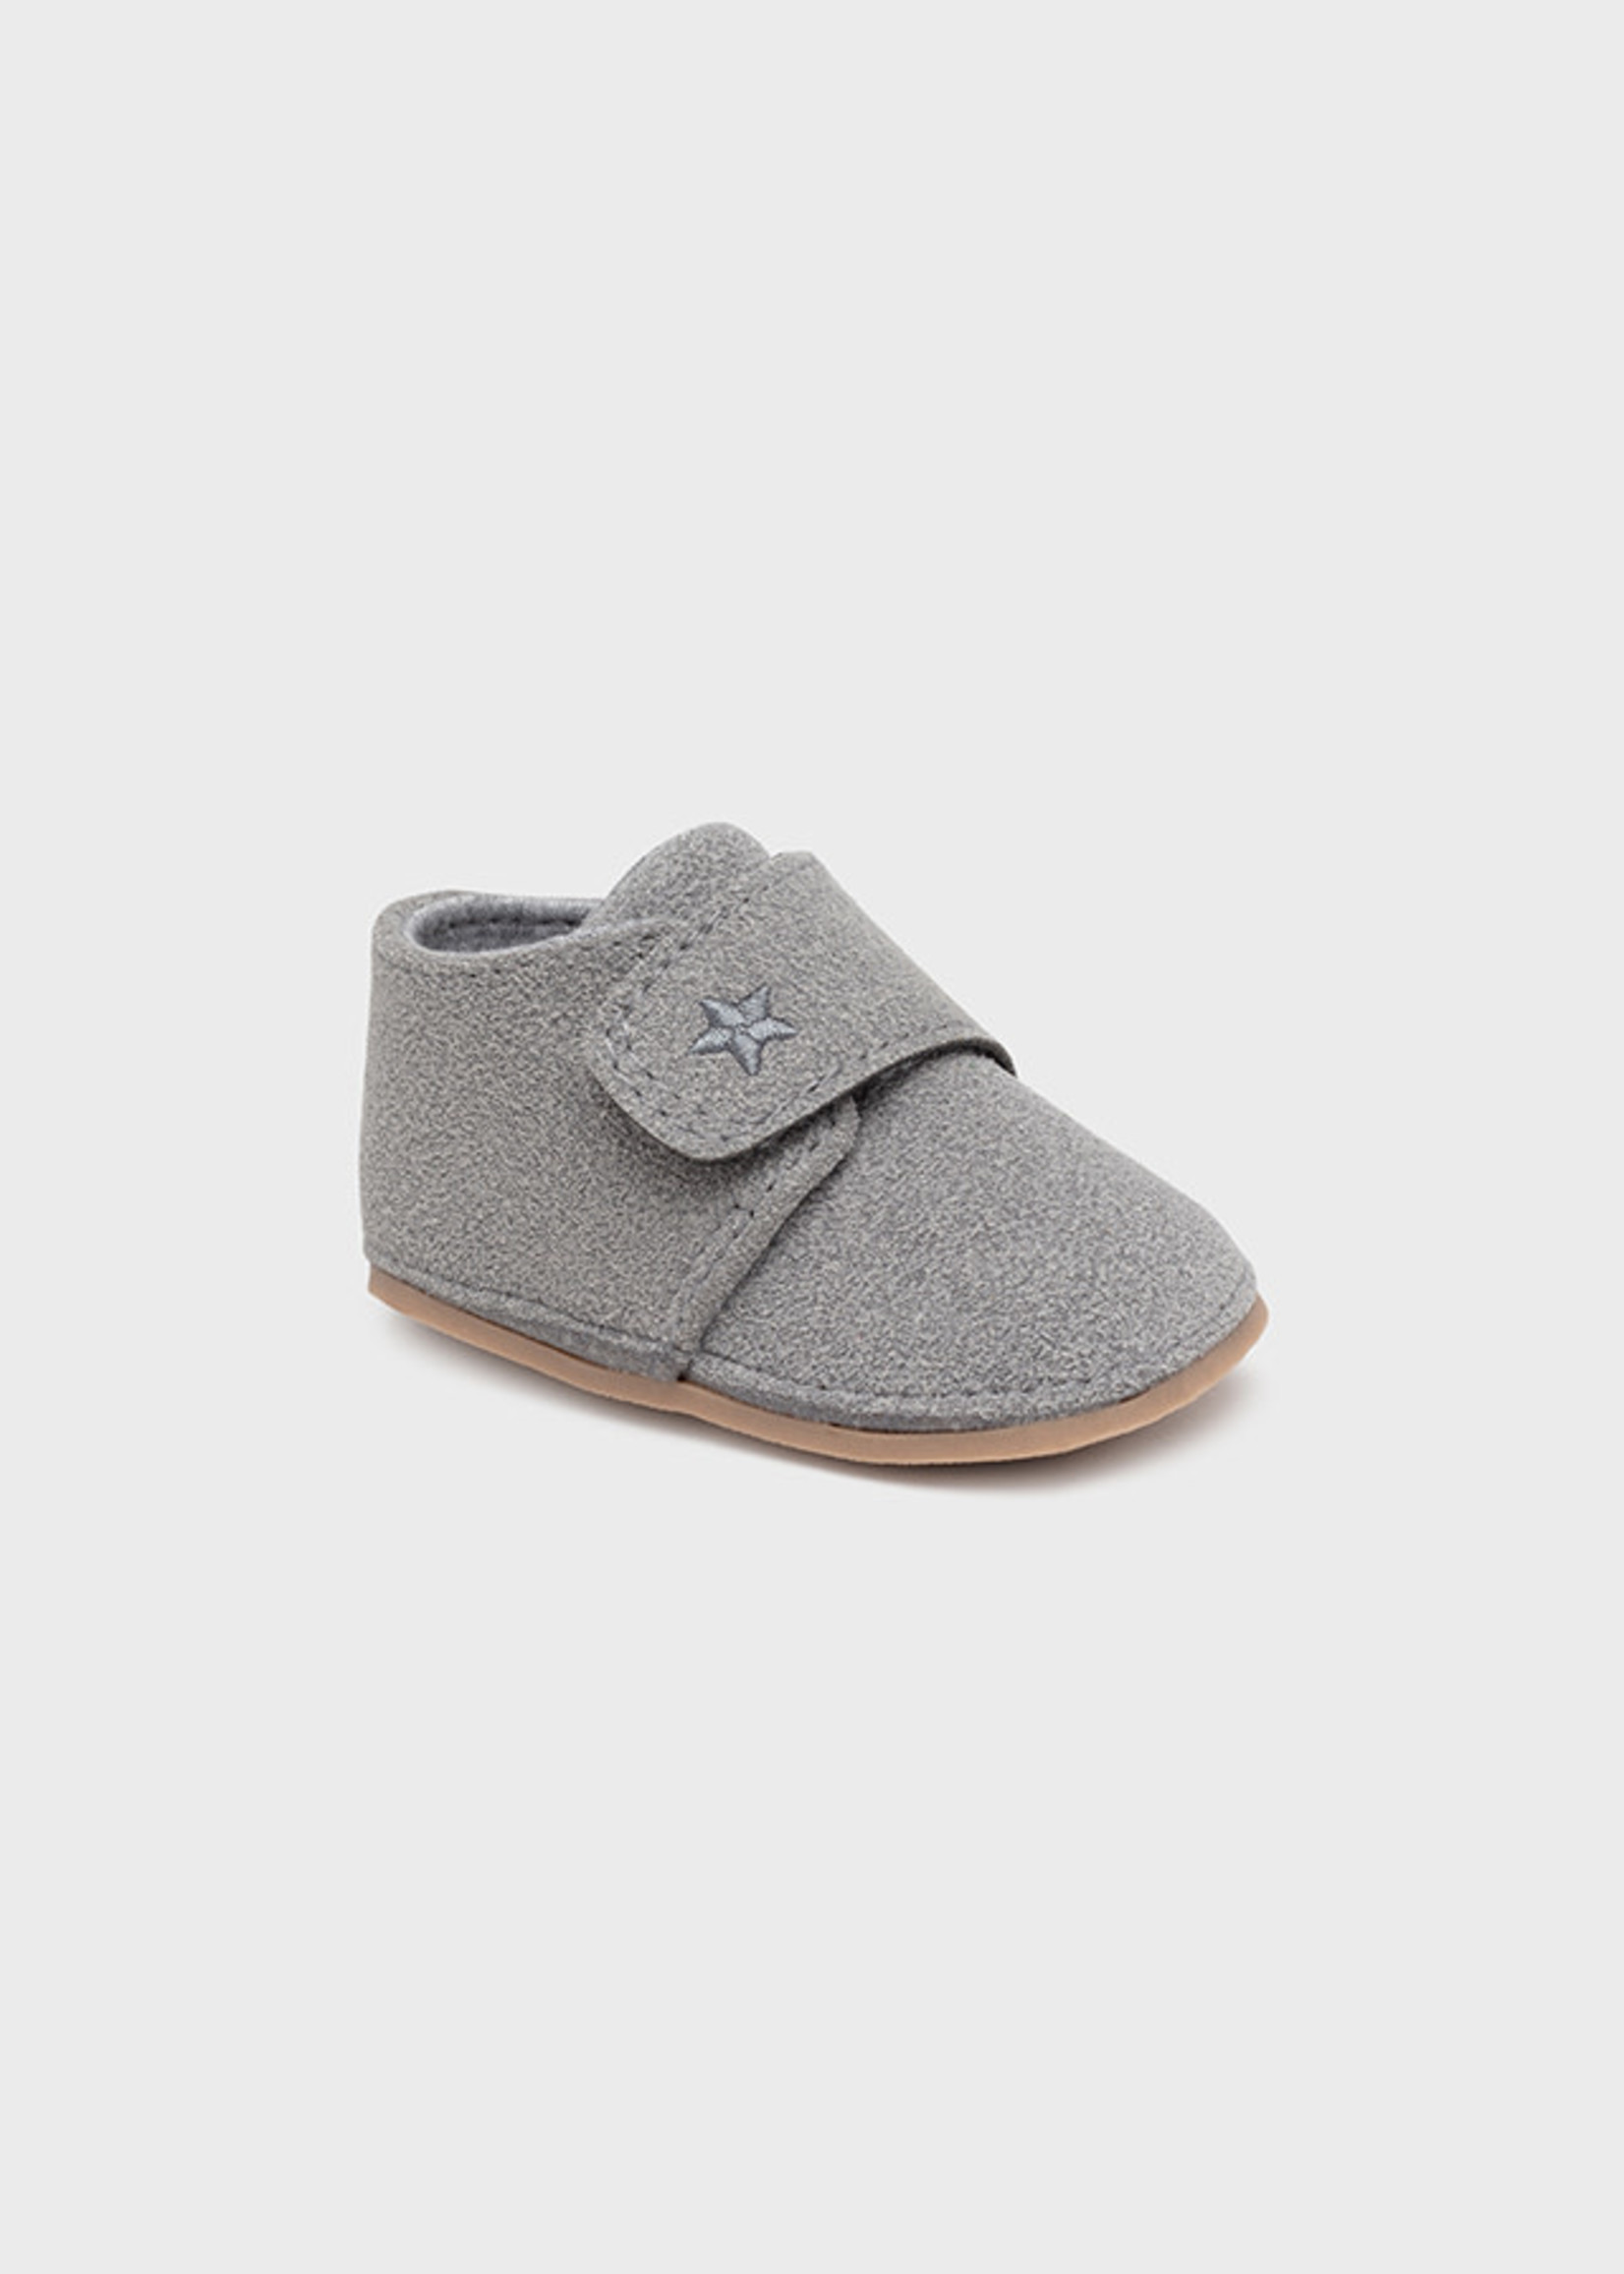 MAYORAL MAYORAL Schoentjes sterretje gray